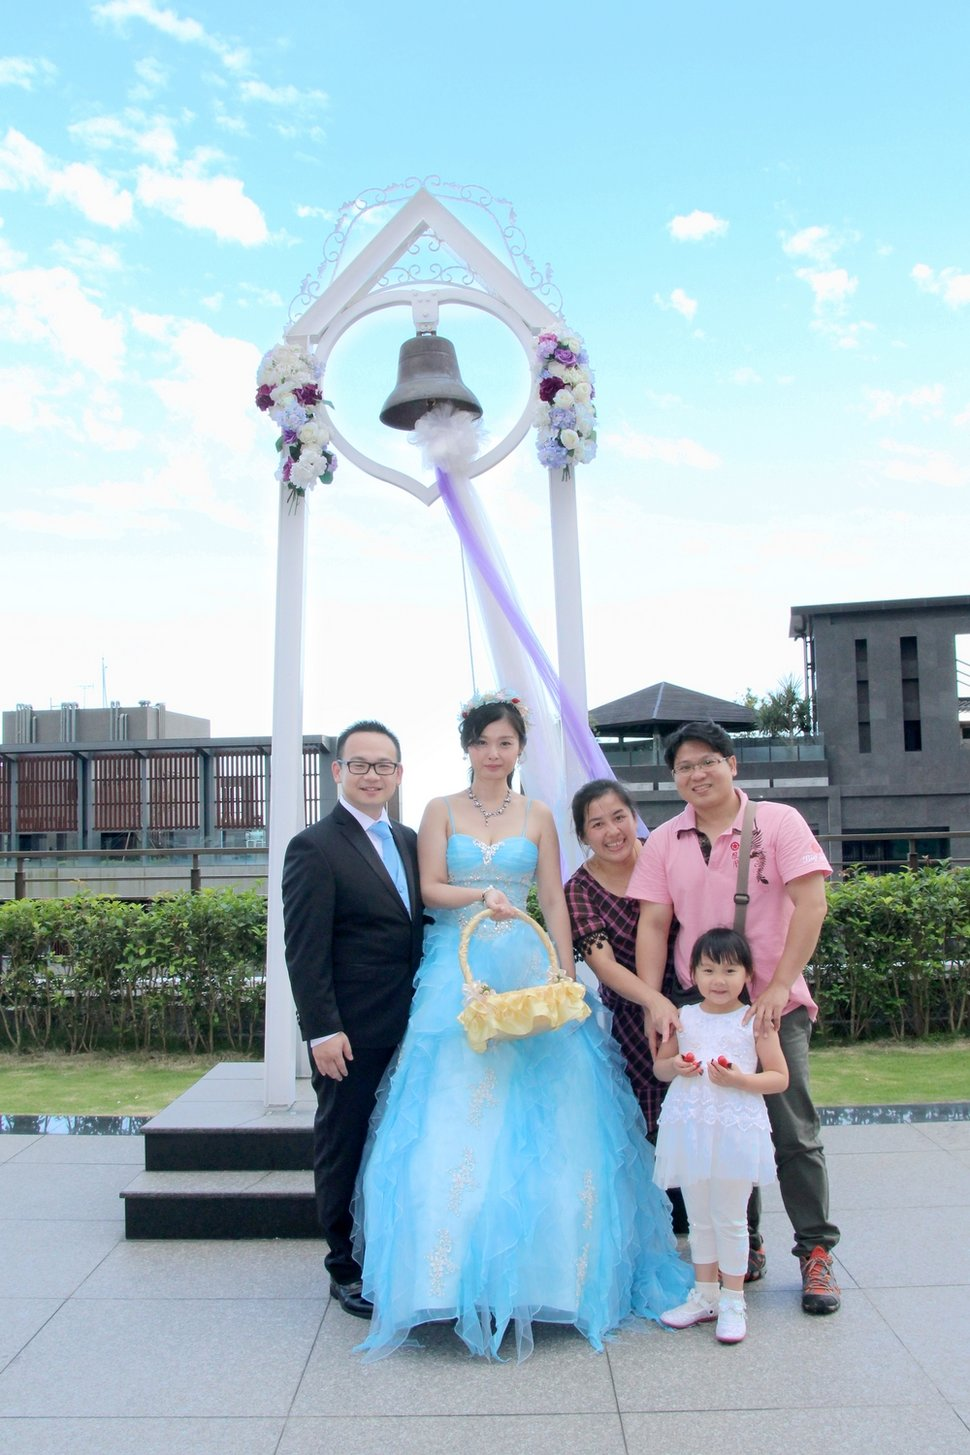 IMG_0358 - 瑞比特婚禮紀錄攝影 - 結婚吧